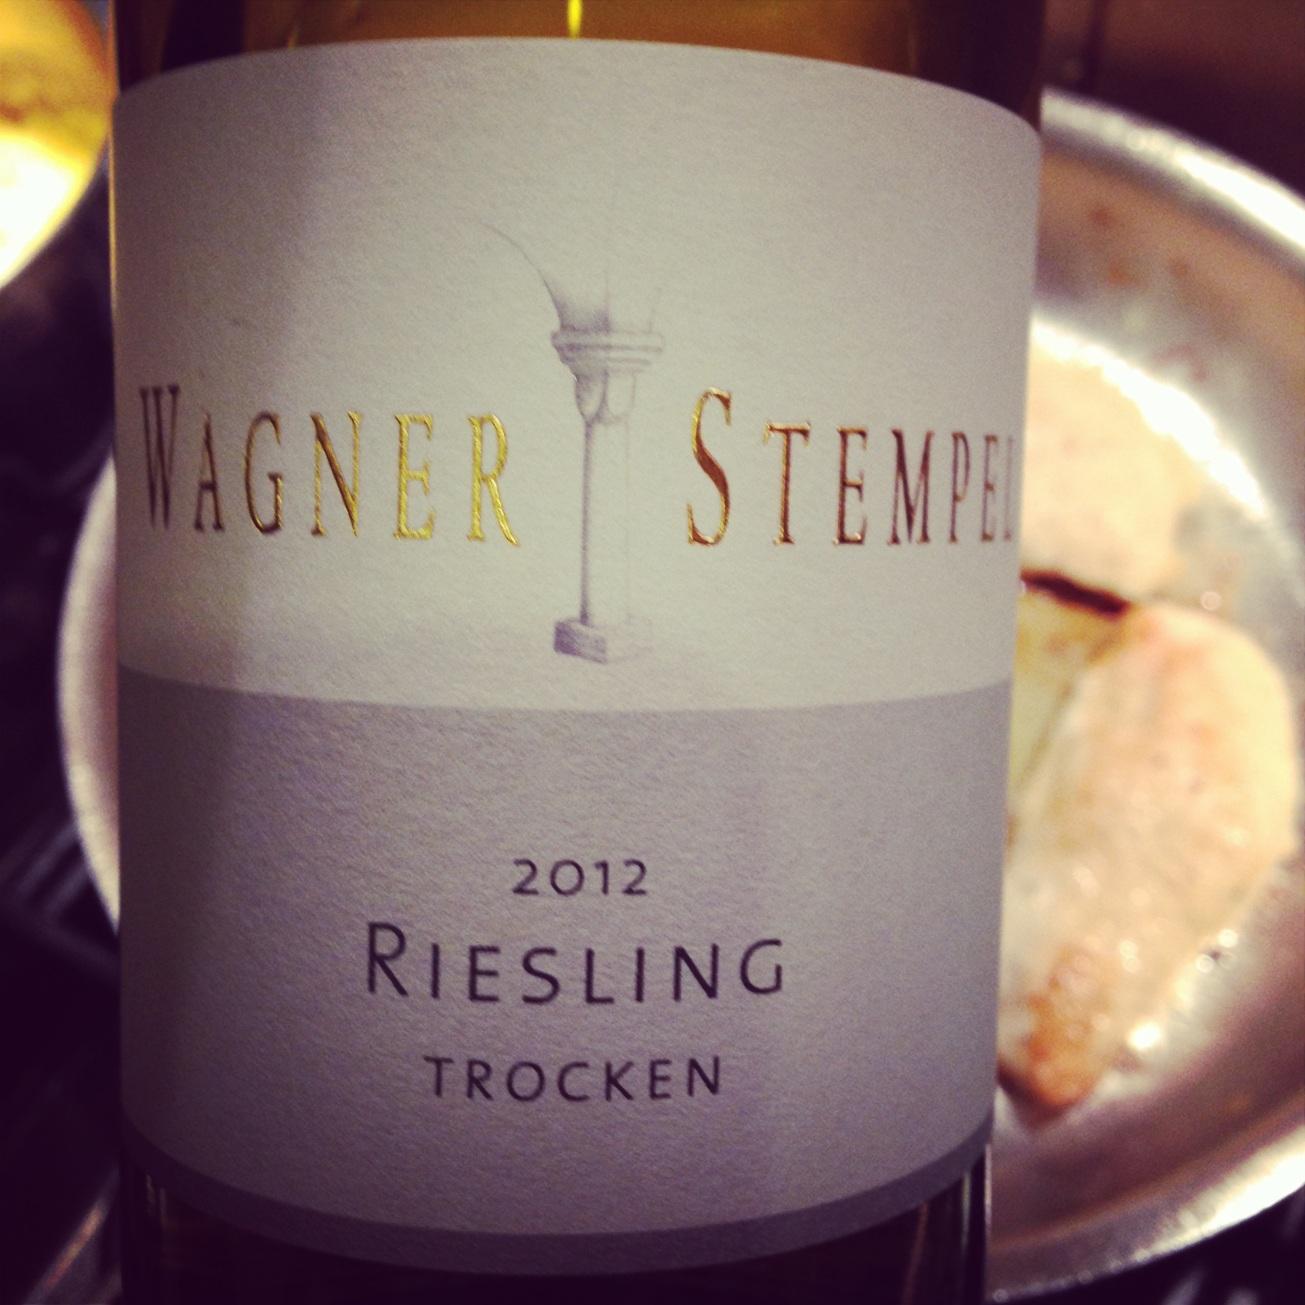 2012 Wagner Stempel Riesling Trocken